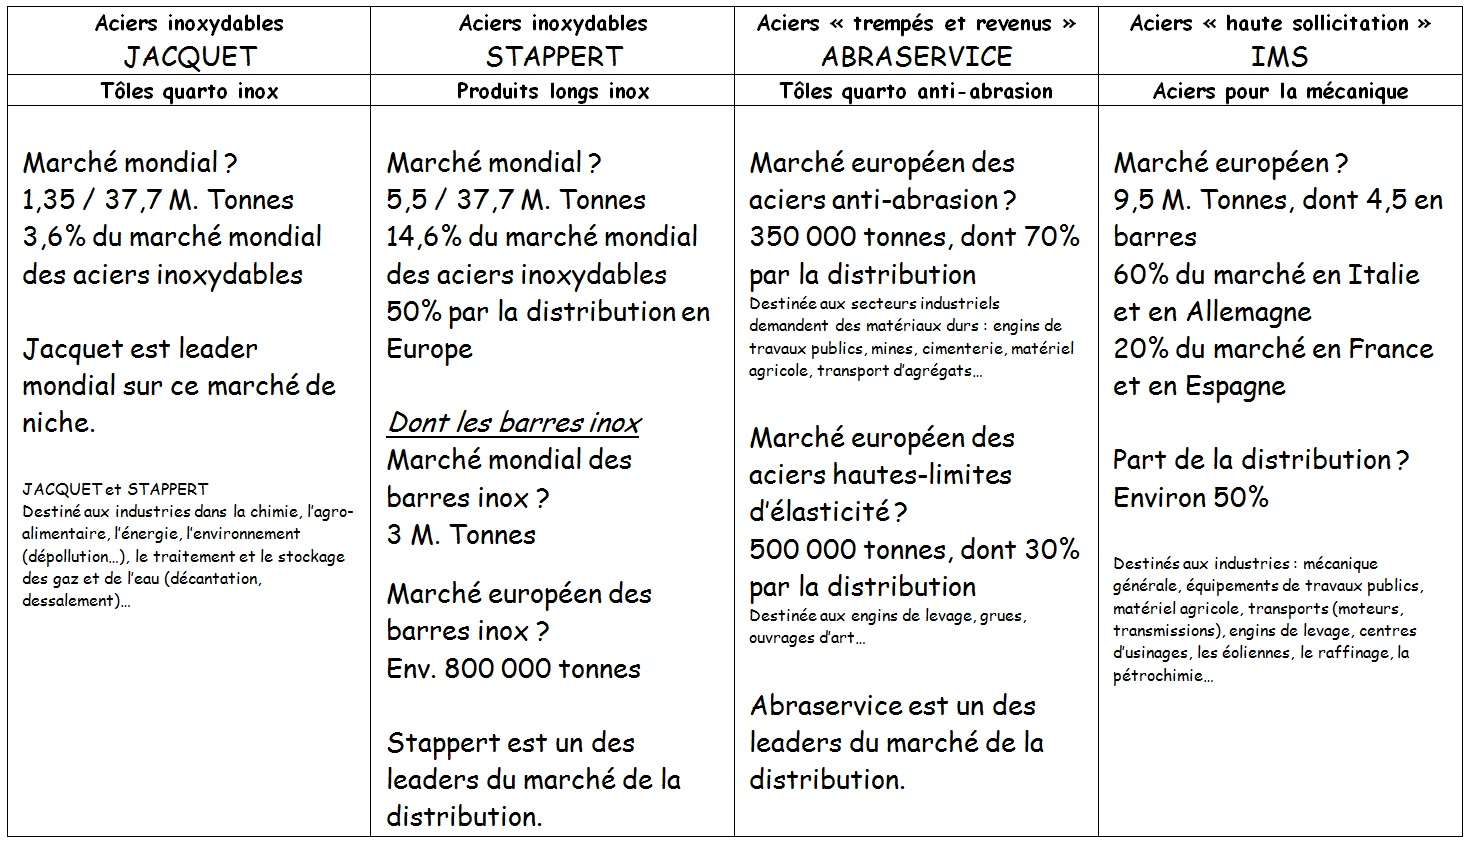 http://maxicool5.free.fr/Bourse/Valorisations/JCQ%20-%20mars%202016/JCQ%20perso%20-%20secteurs.jpg